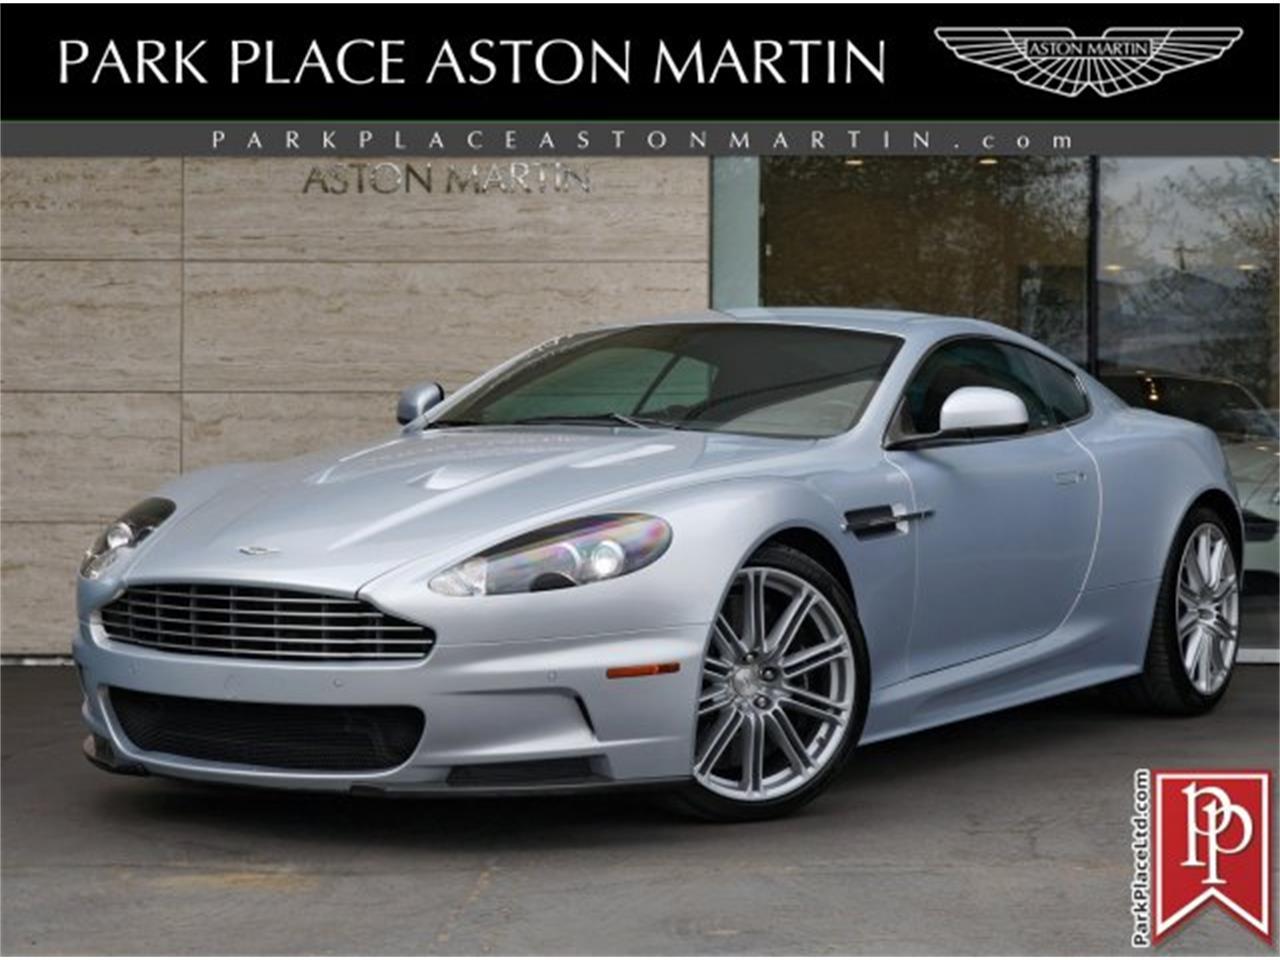 2010 Aston Martin Dbs For Sale Classiccars Com Cc 1088376